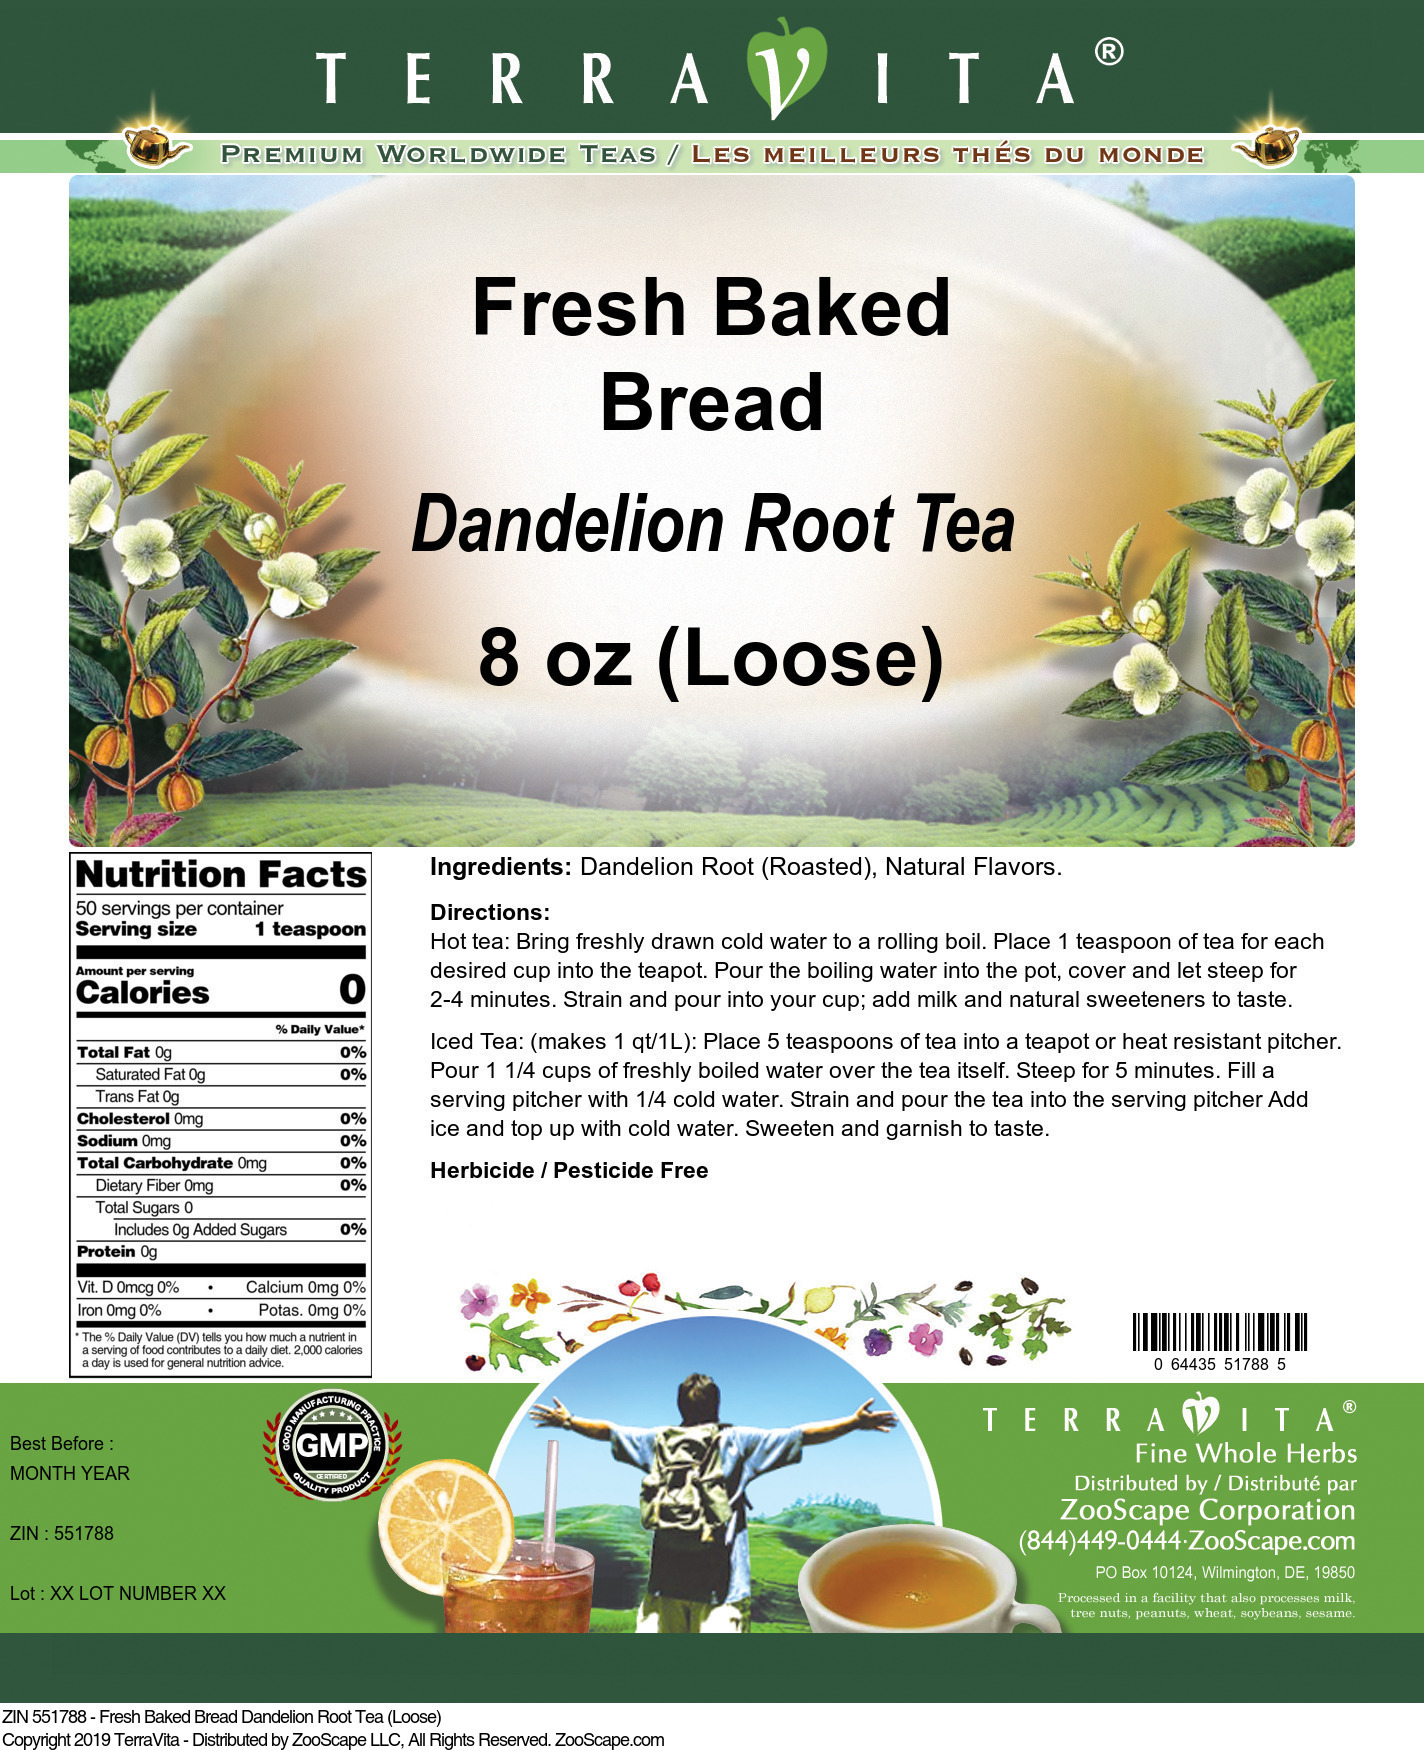 Fresh Baked Bread Dandelion Root Tea (Loose)